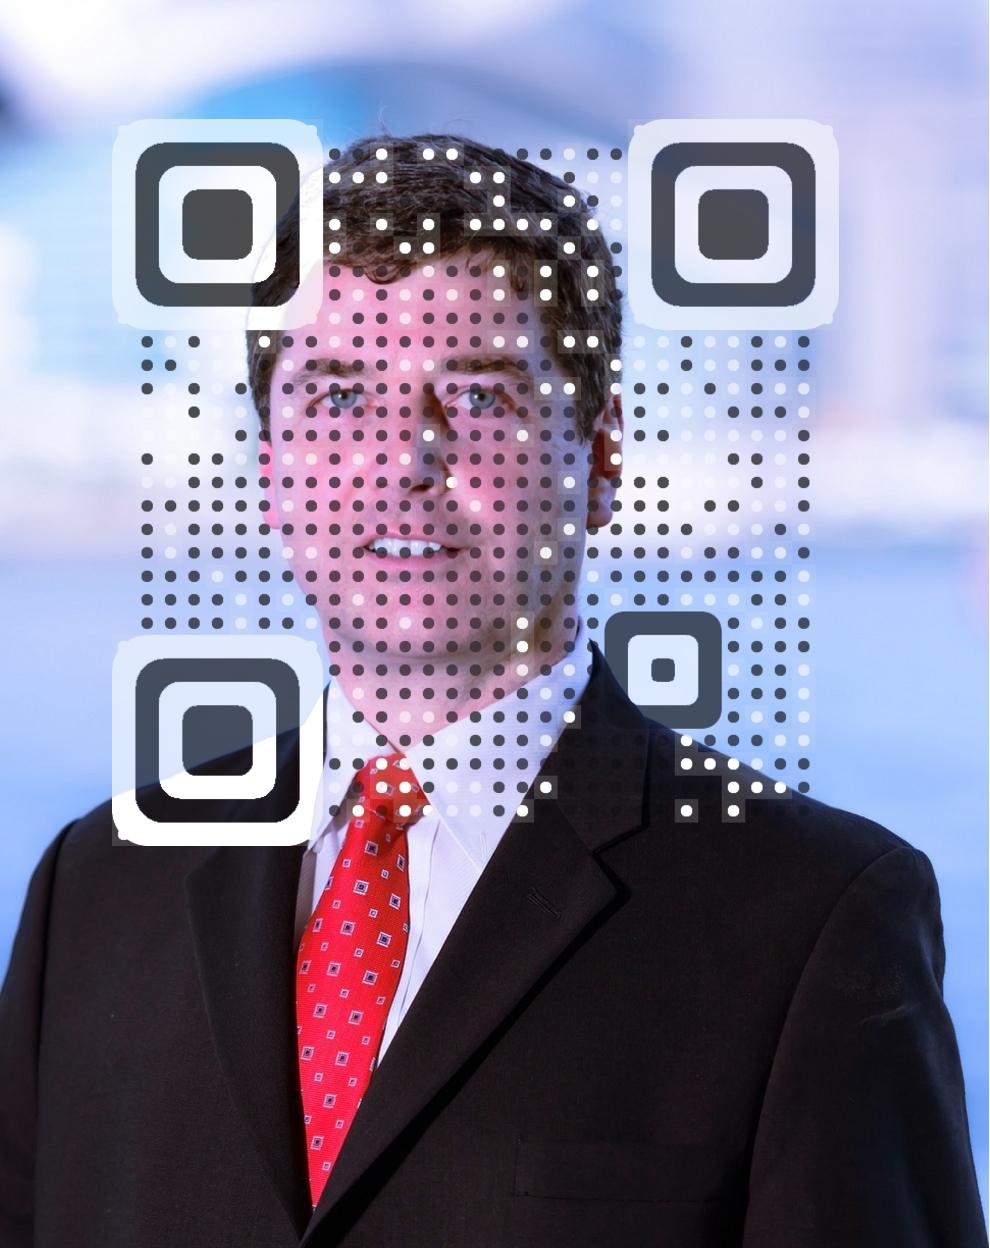 Roland J. Jossi vCard QR Code